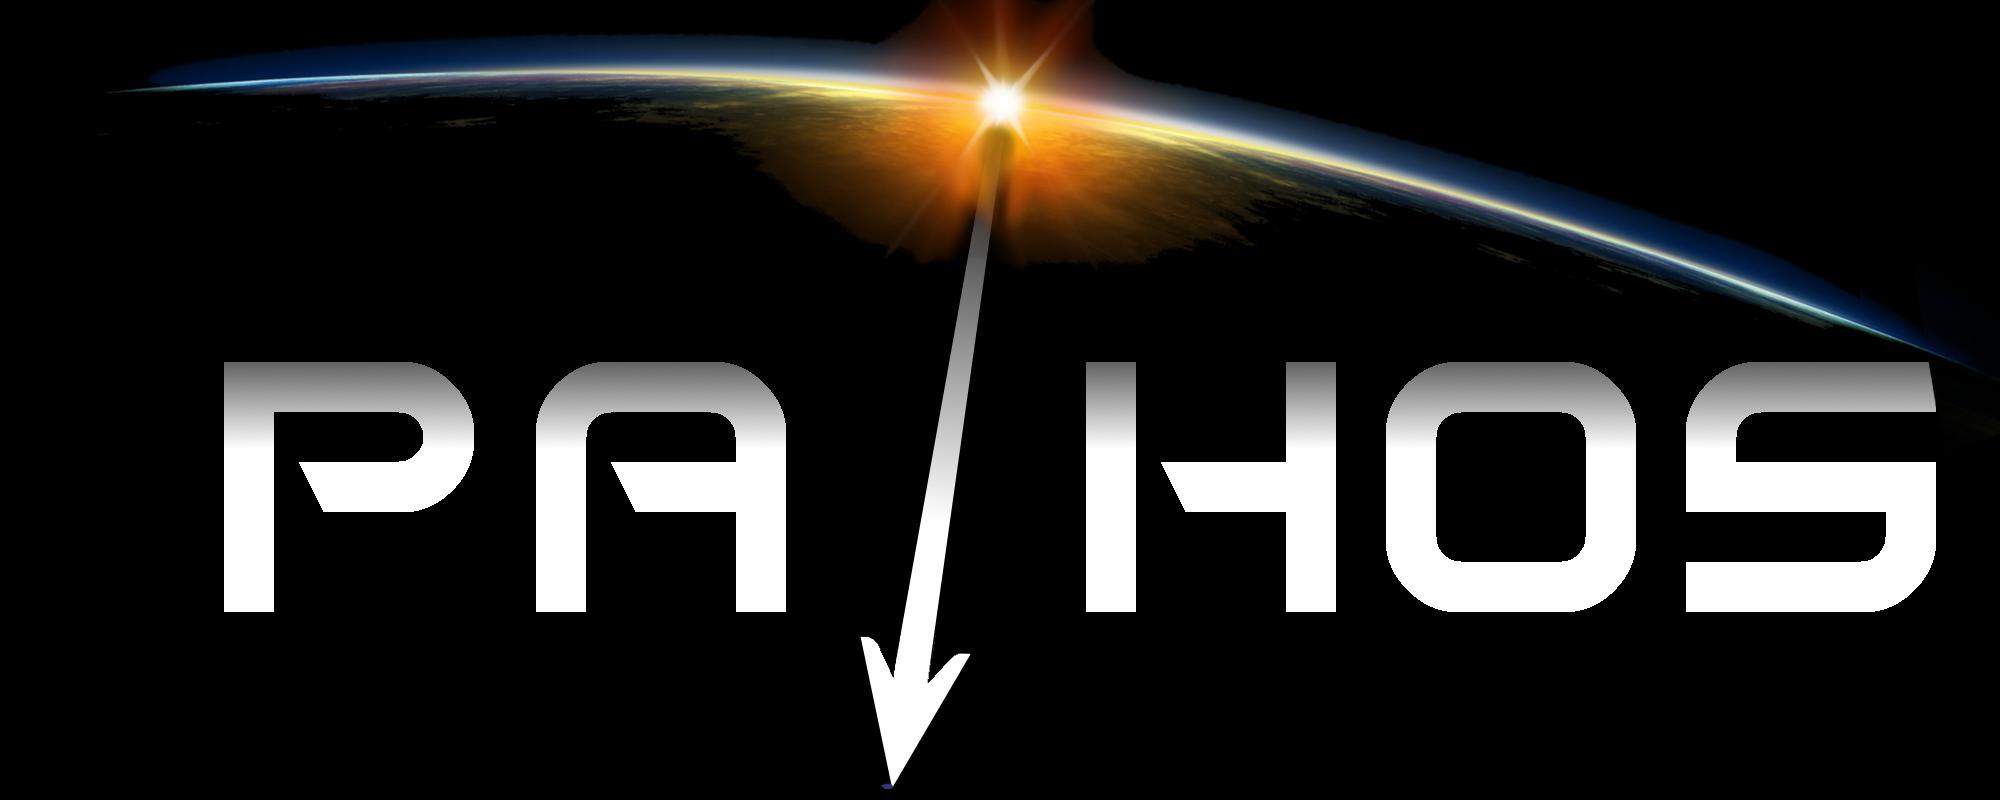 pathos_logo_alpha